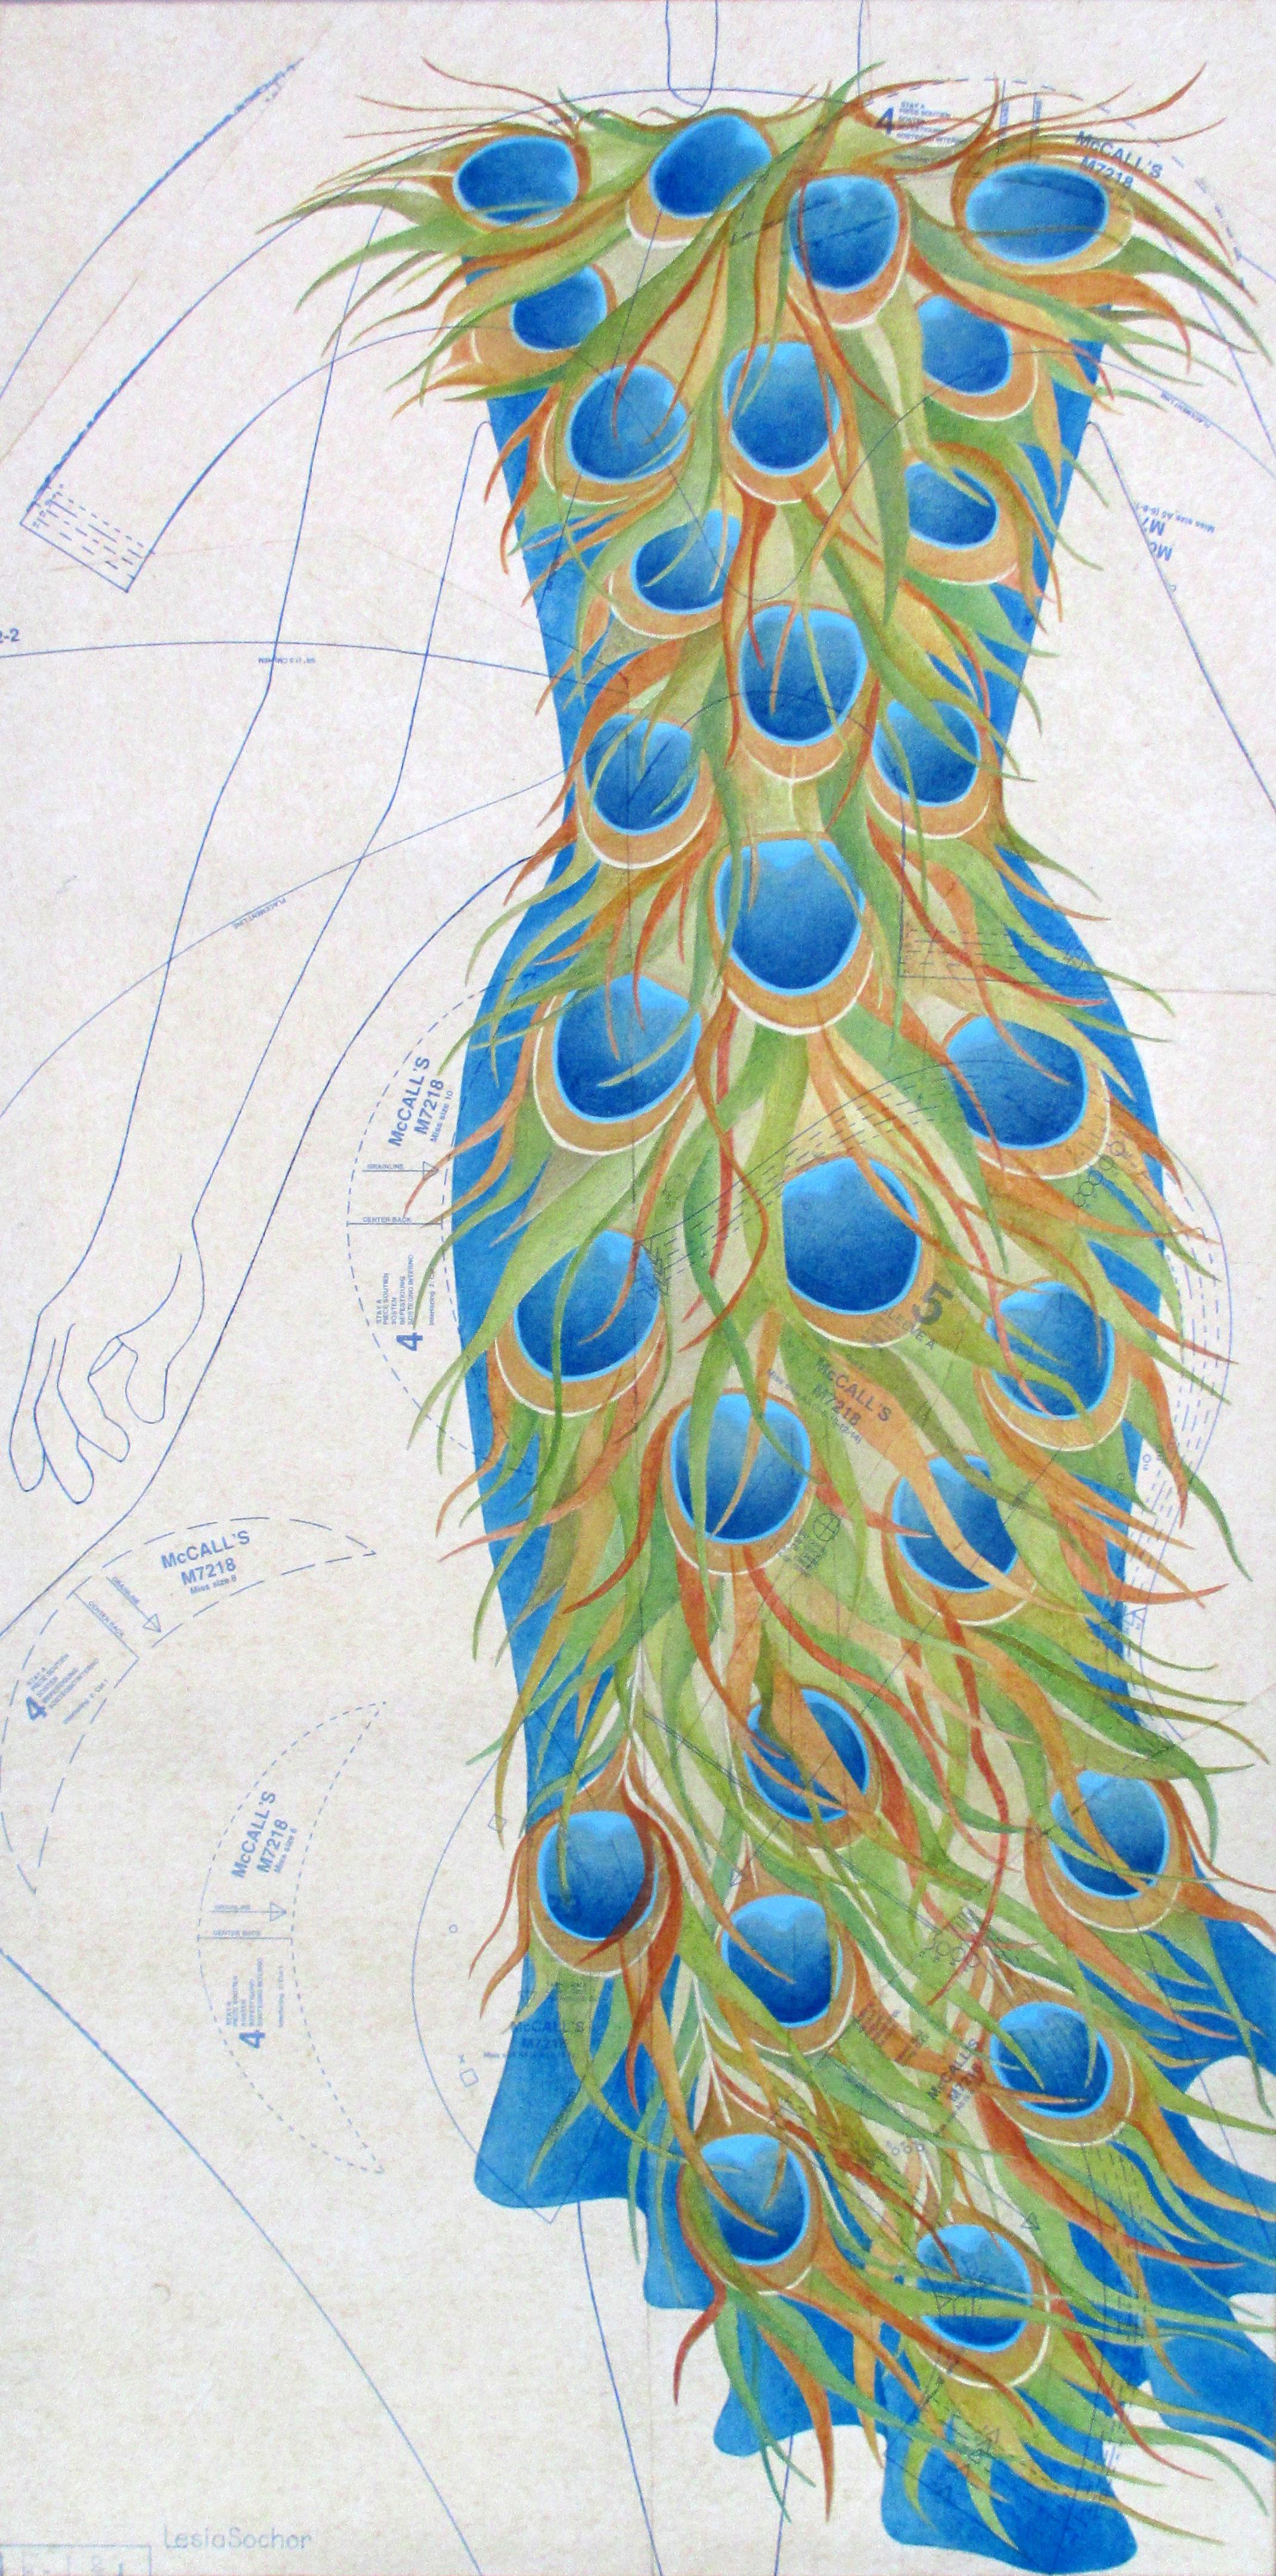 Sochor Lesia 'Preening' oil on collaged sewing pattern paper  24x48.jpg